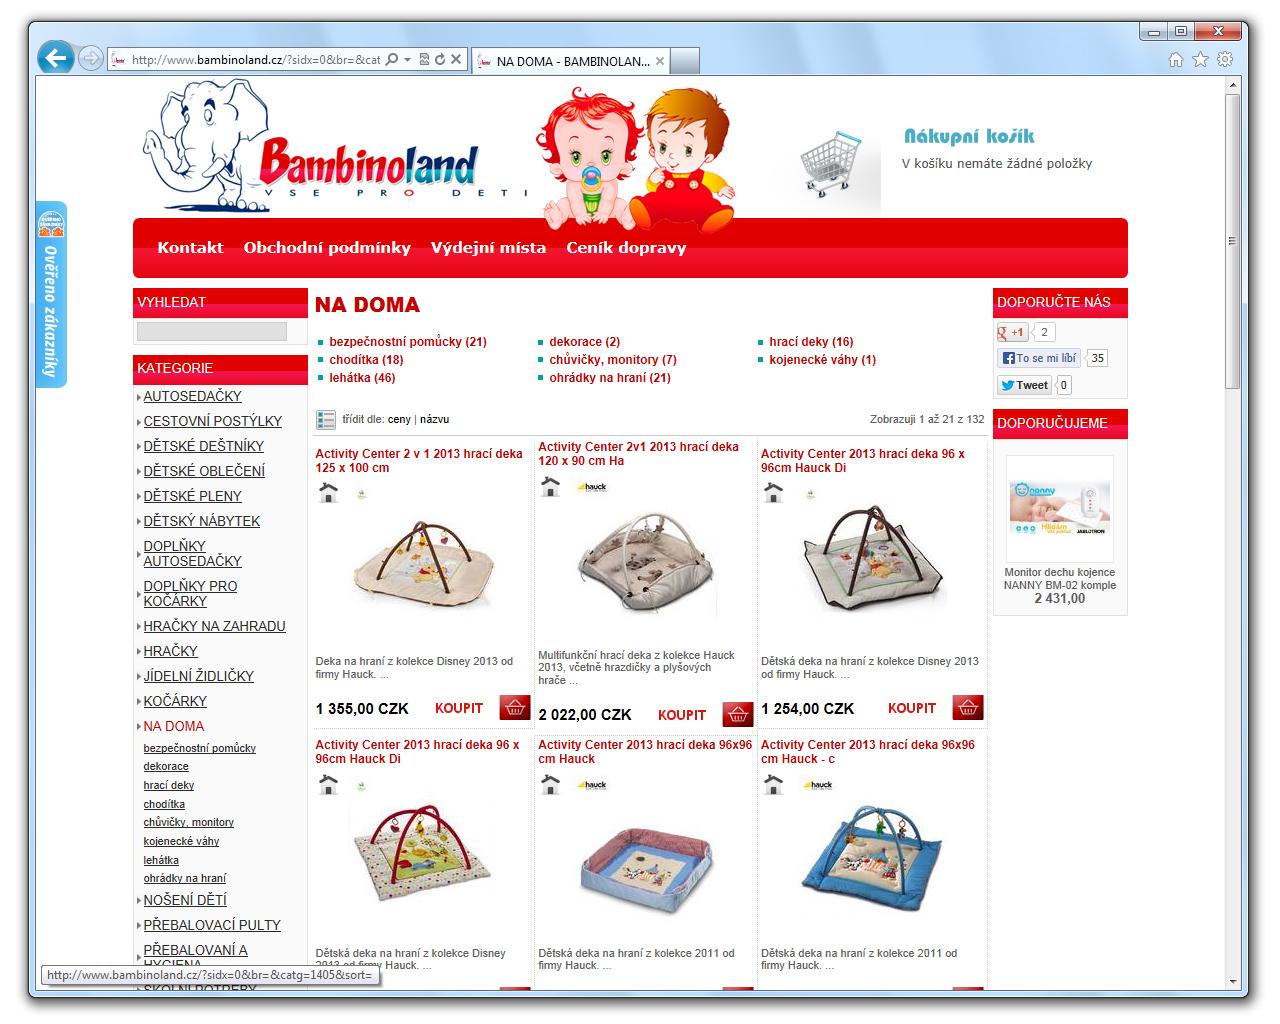 www.BAMBINOLAND.cz [ProFact 3.0 E-SHOP] by eXmind-ProFact